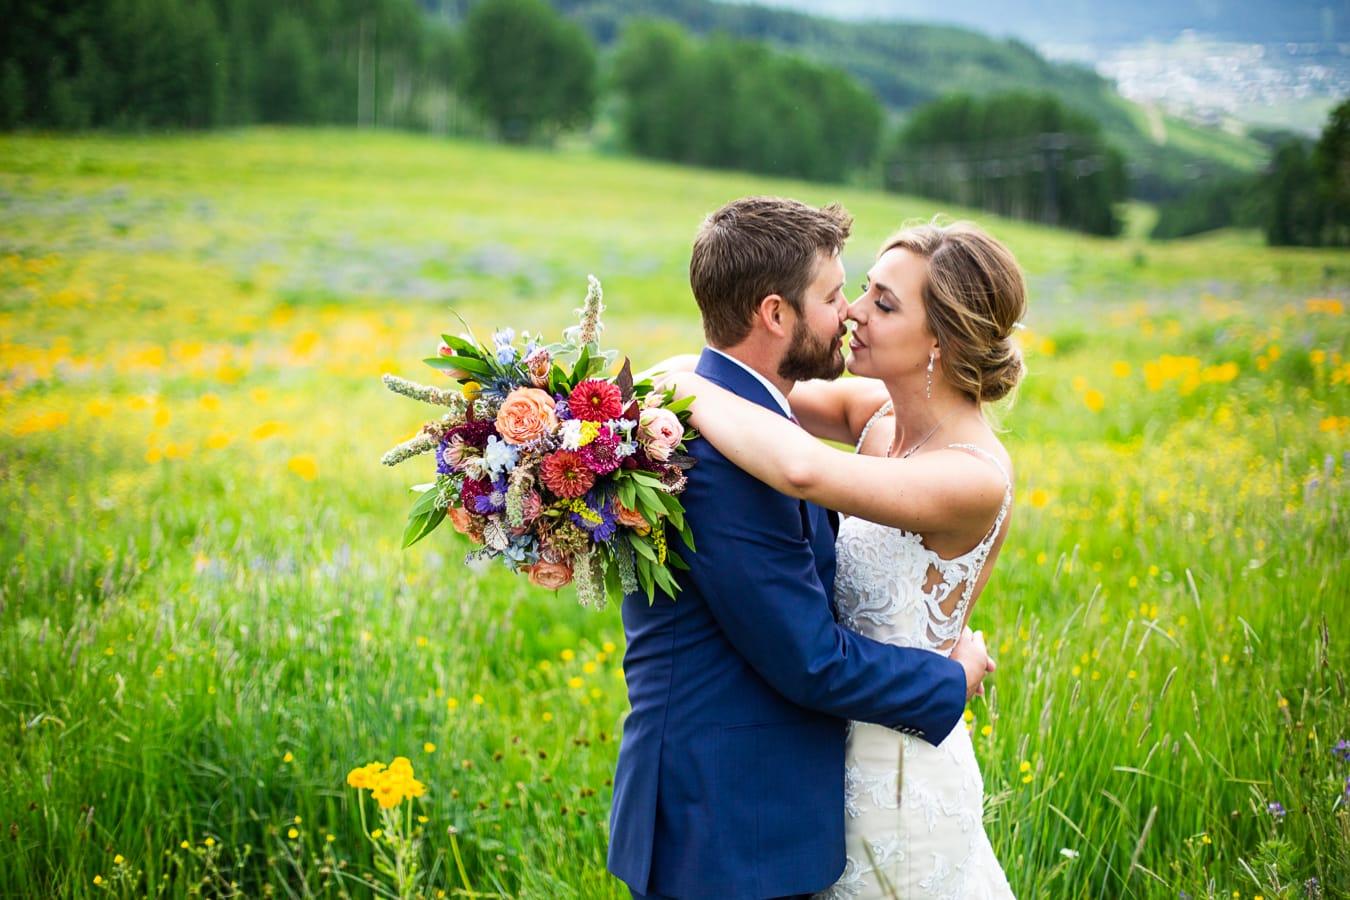 Ten Peaks Wedding Photographer – Crested Butte, Colorado